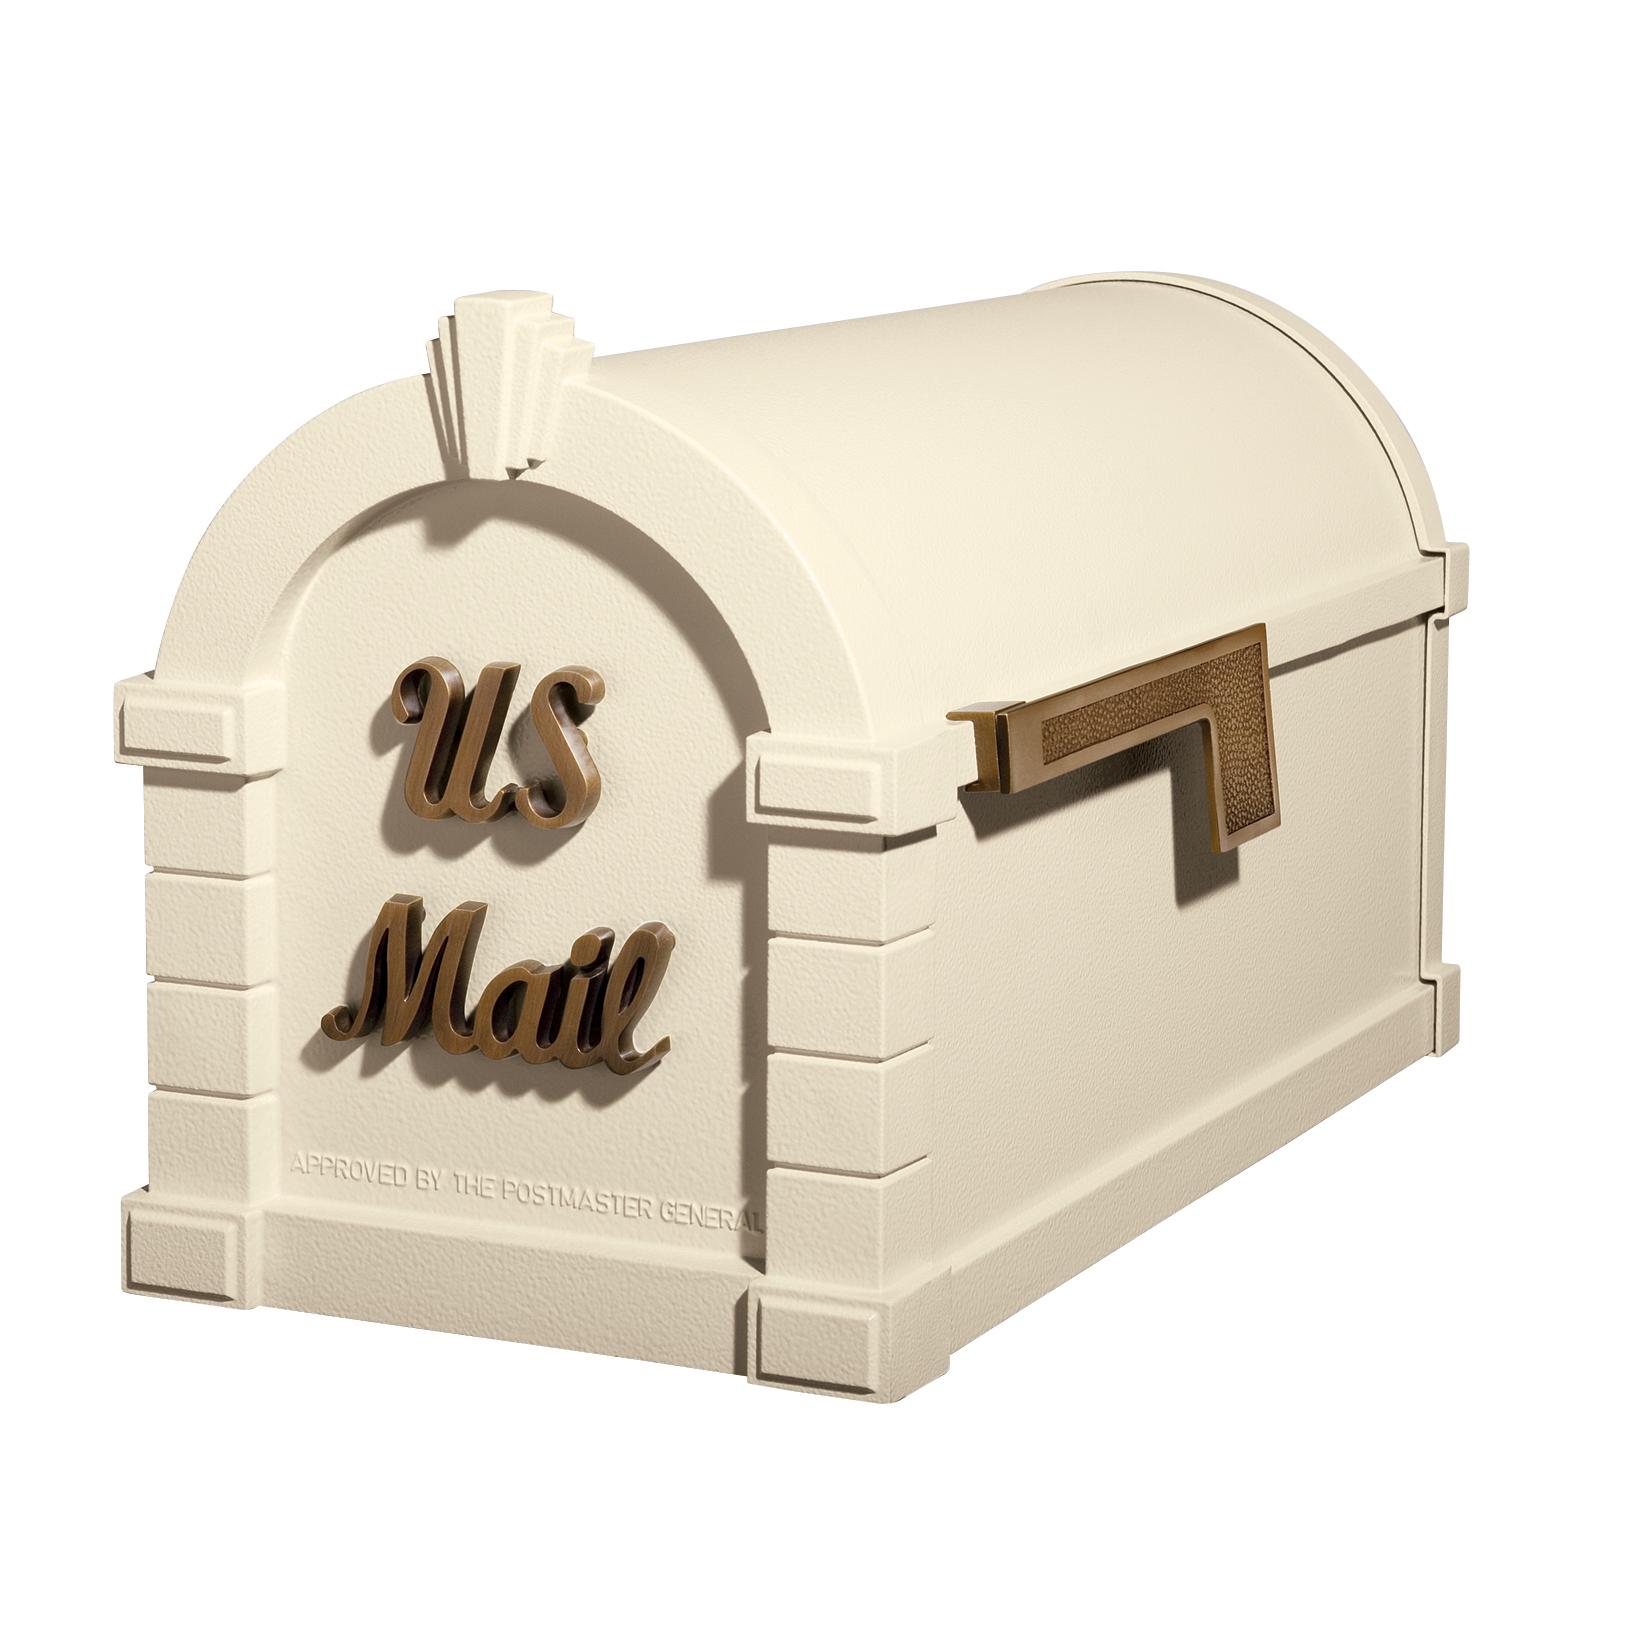 Gaines Signature Keystone MailboxesAlmond with Antique Bronze